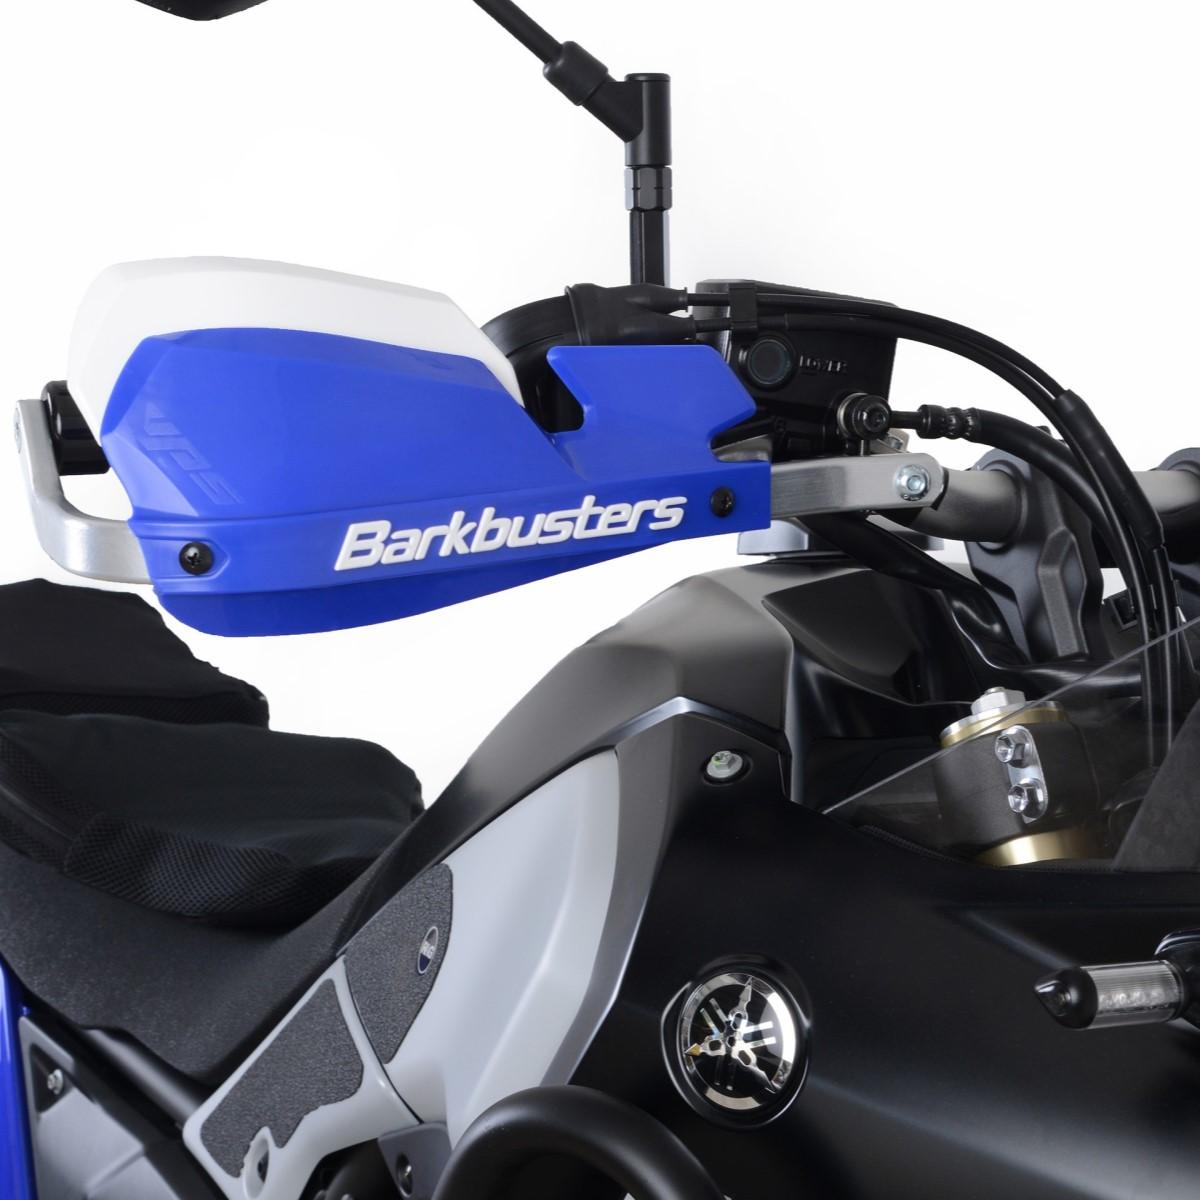 Barkbusters Bike Specific Hardware Kit For YAMAHA